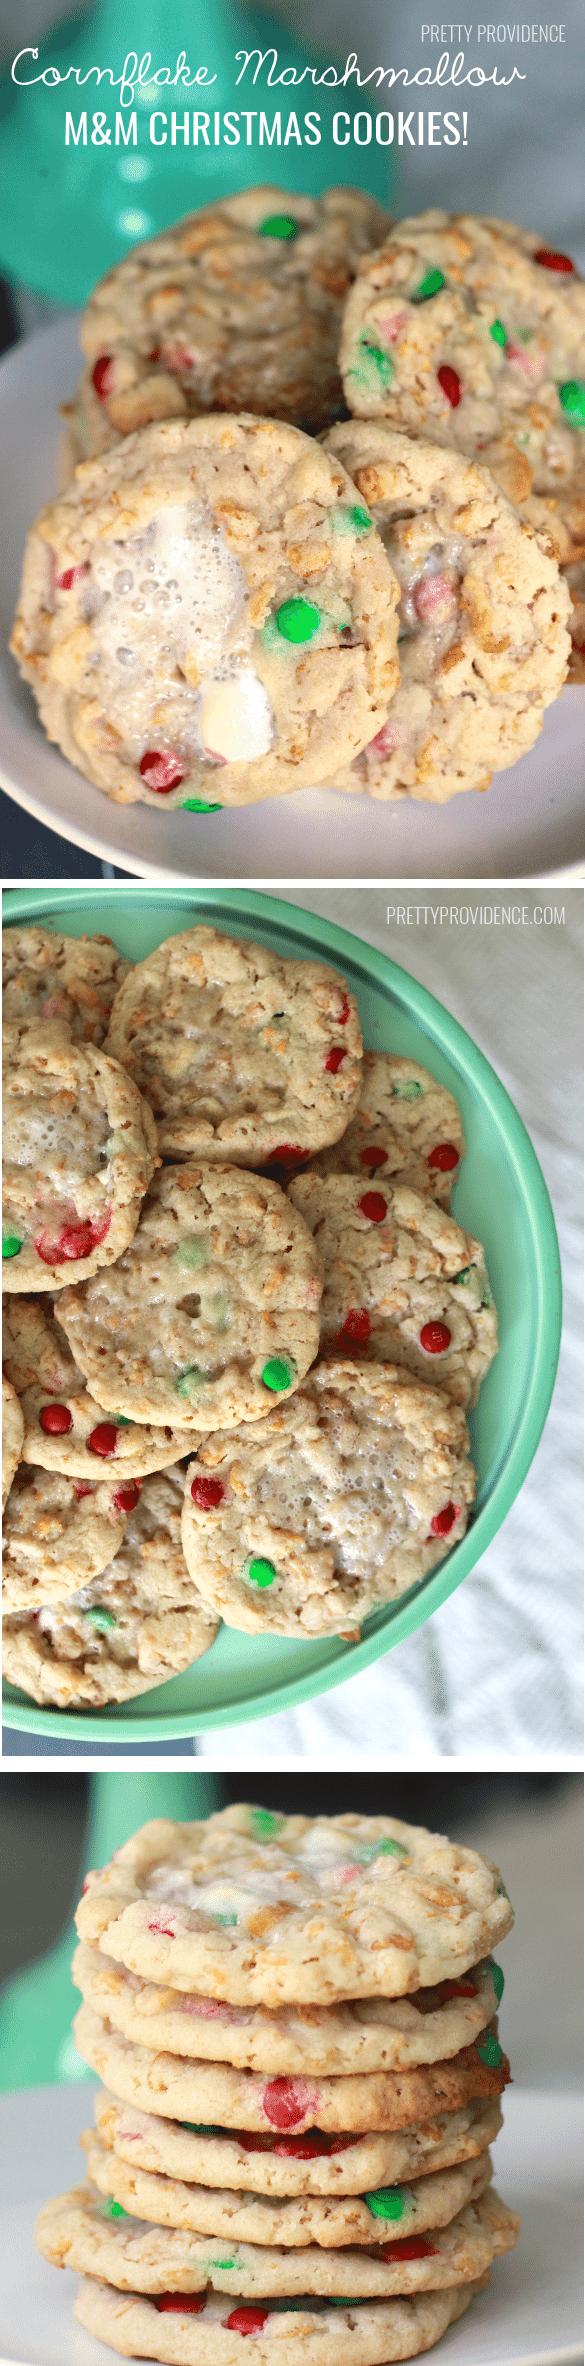 christmas-cookies-momofuku-marshmallow-cornflake